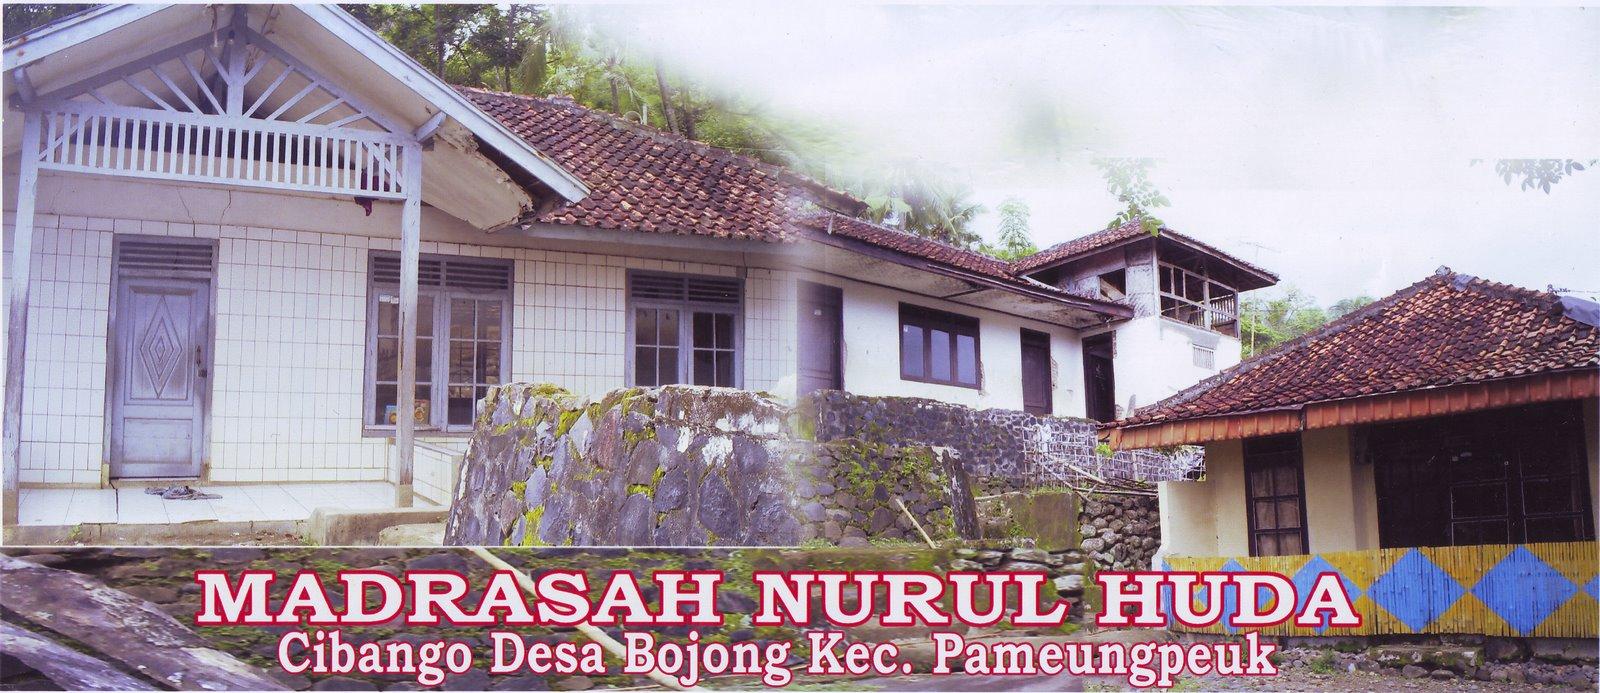 MADRASAH NURUL HUDA